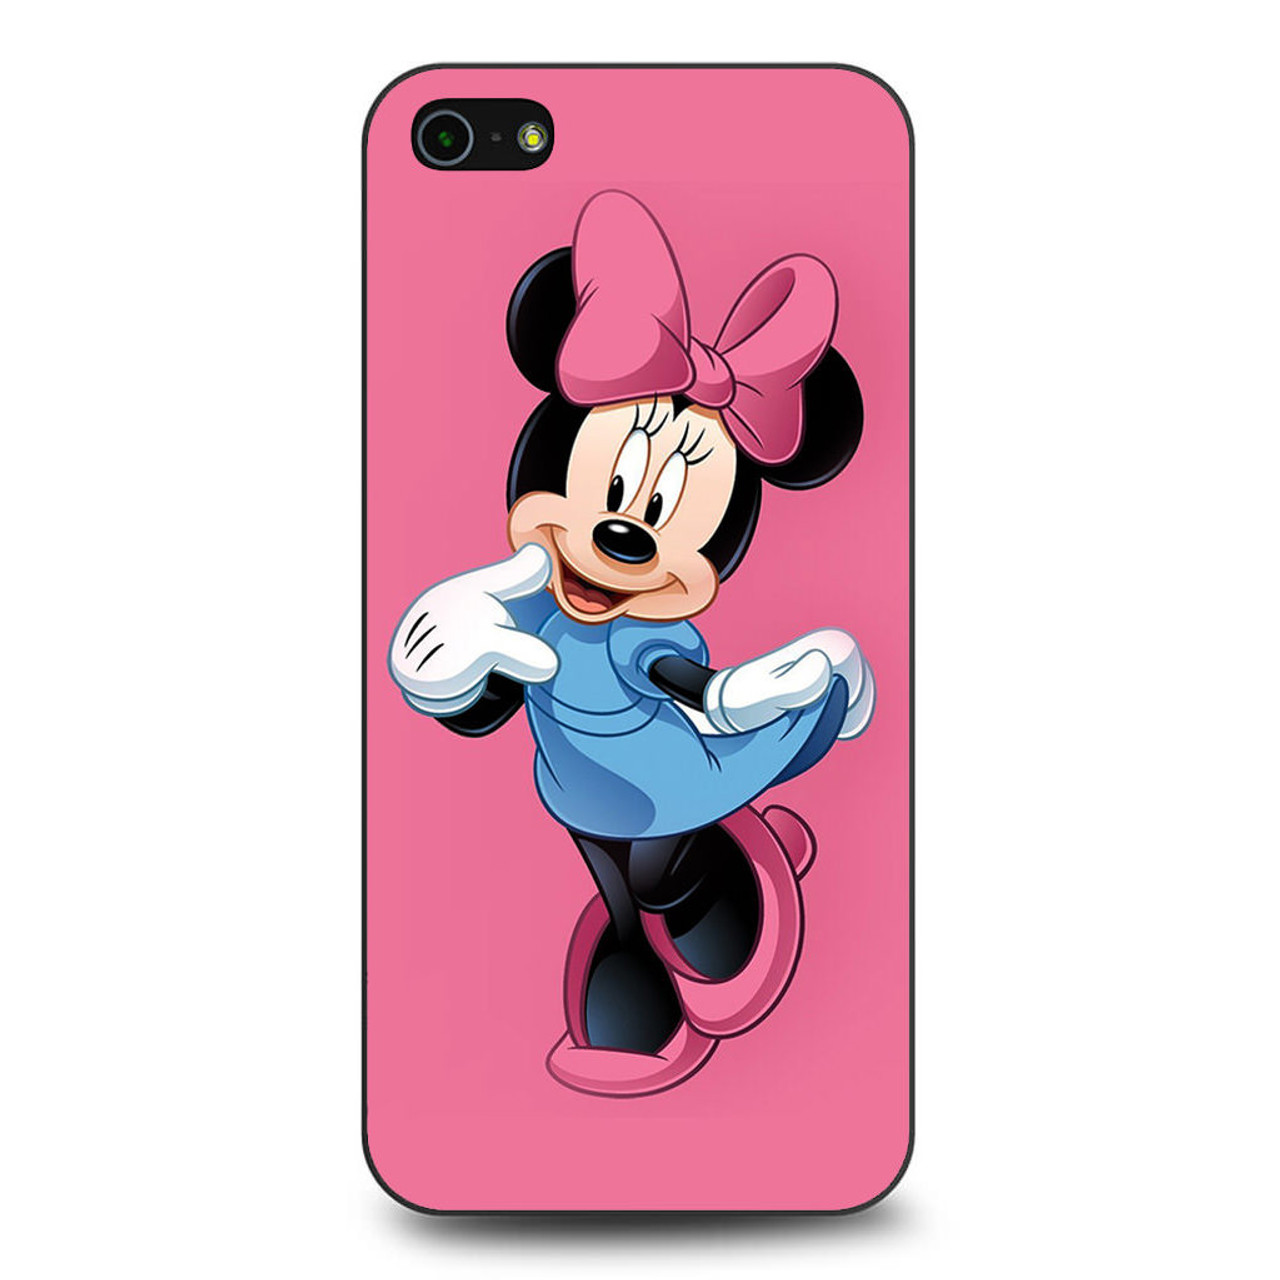 sale retailer 8dd5b 4ffef Minnie Mouse Disney Art iPhone 5/5S/SE Case